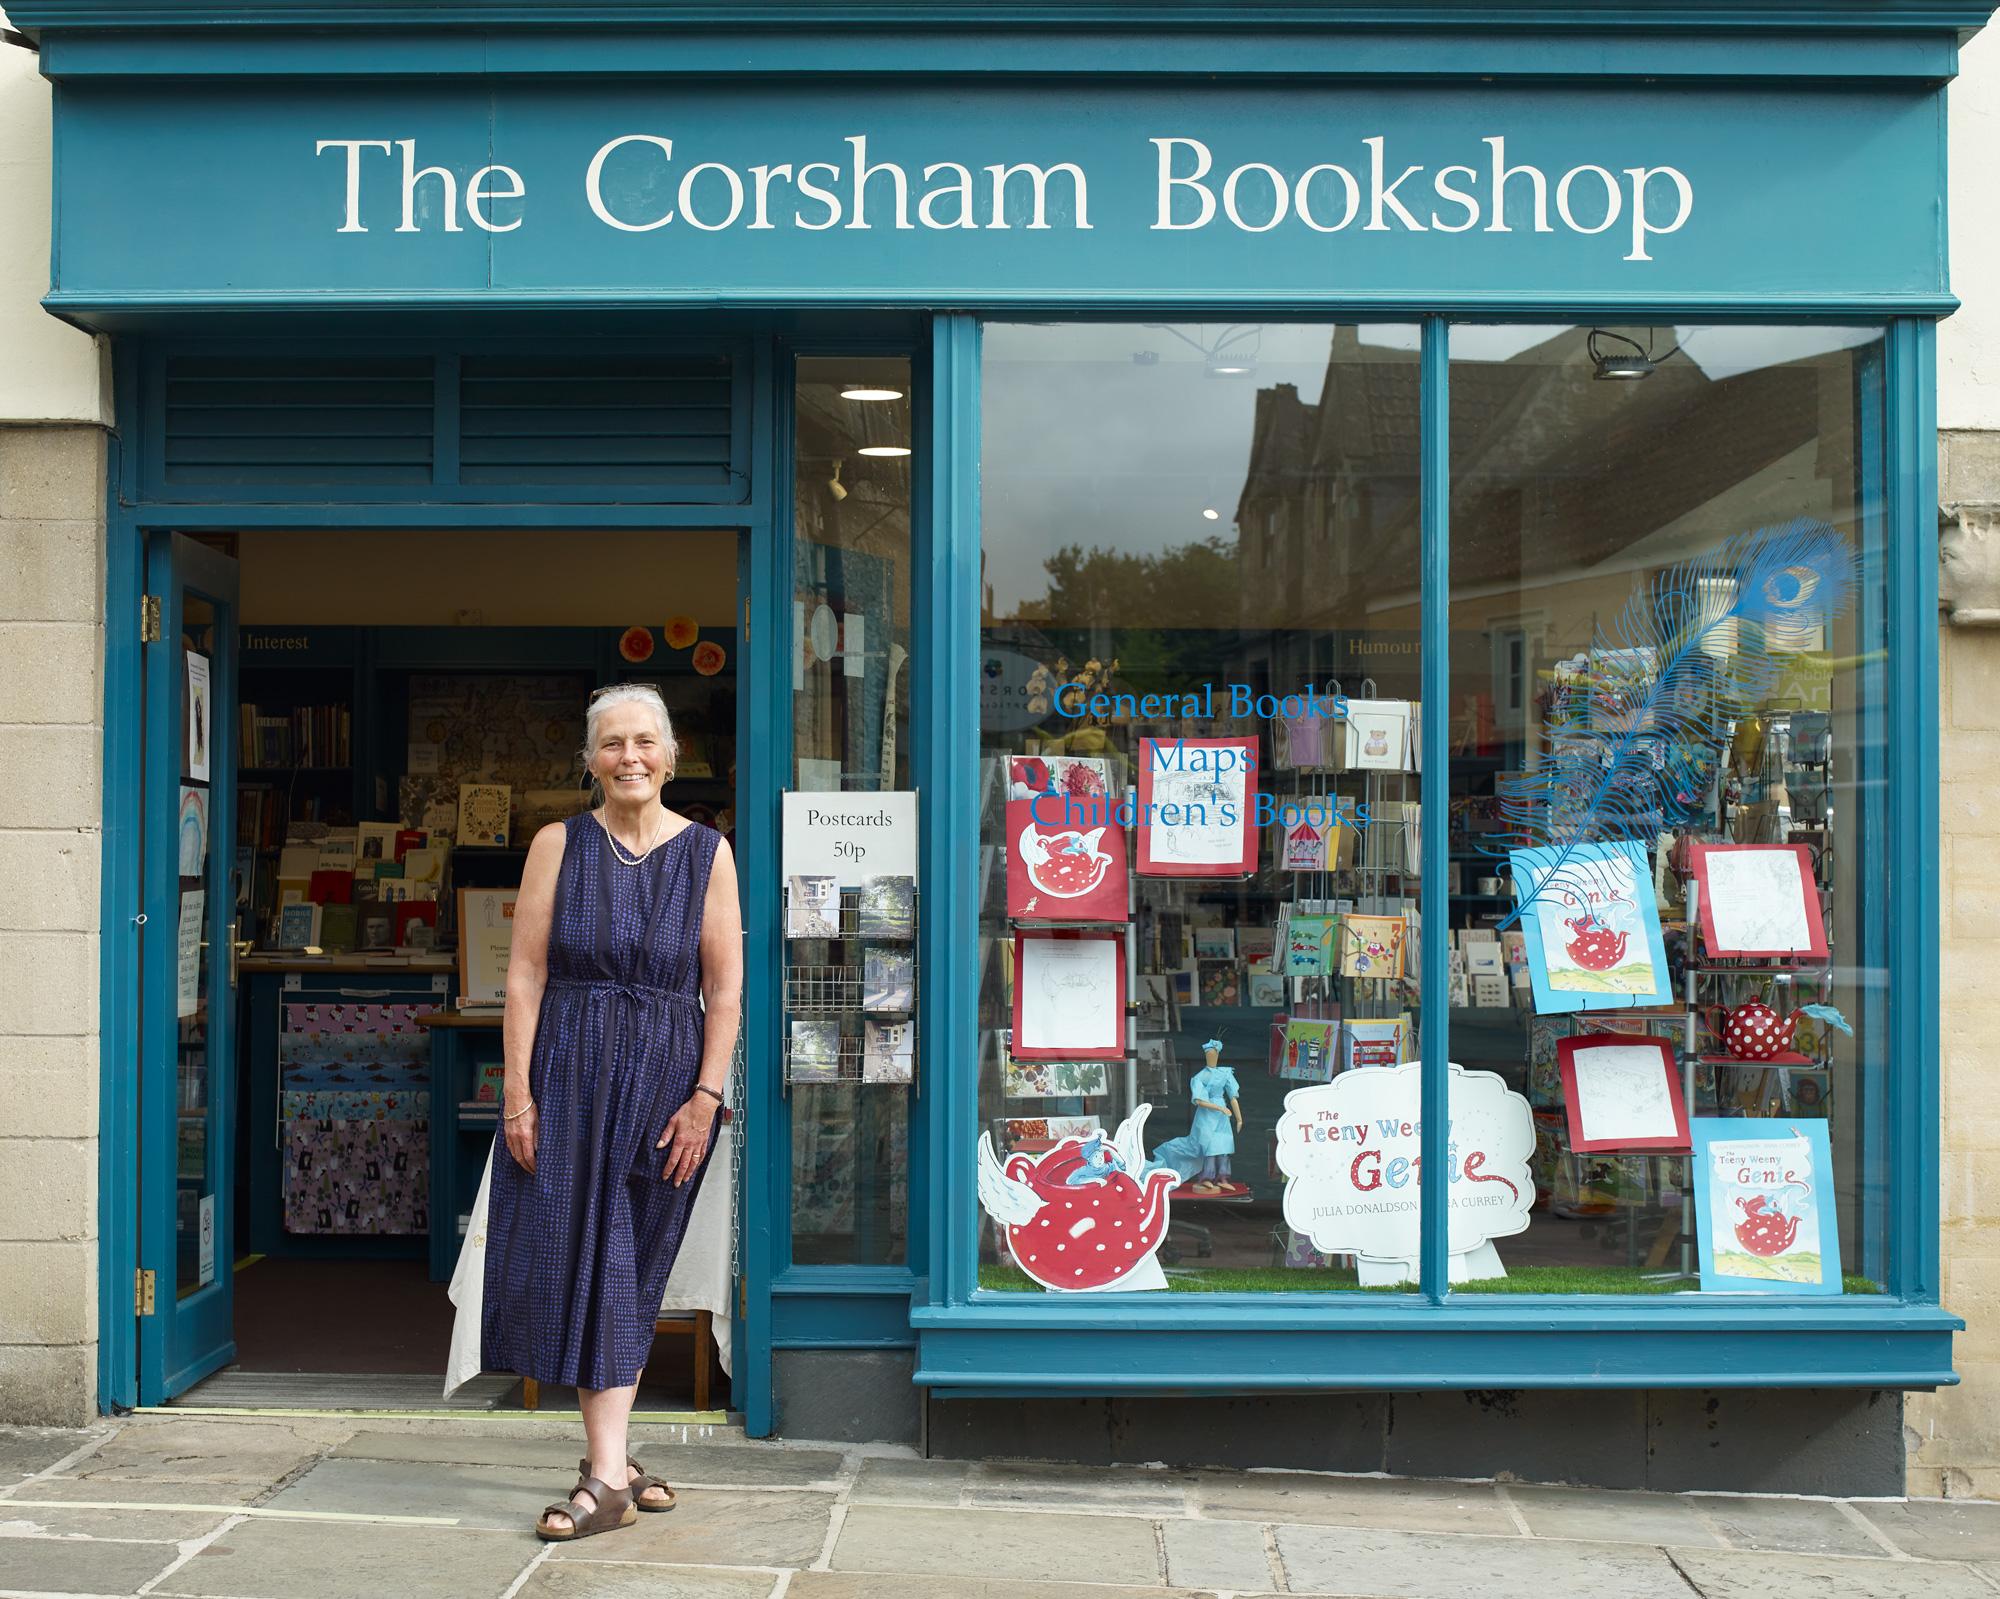 The Corsham Bookshop Outside